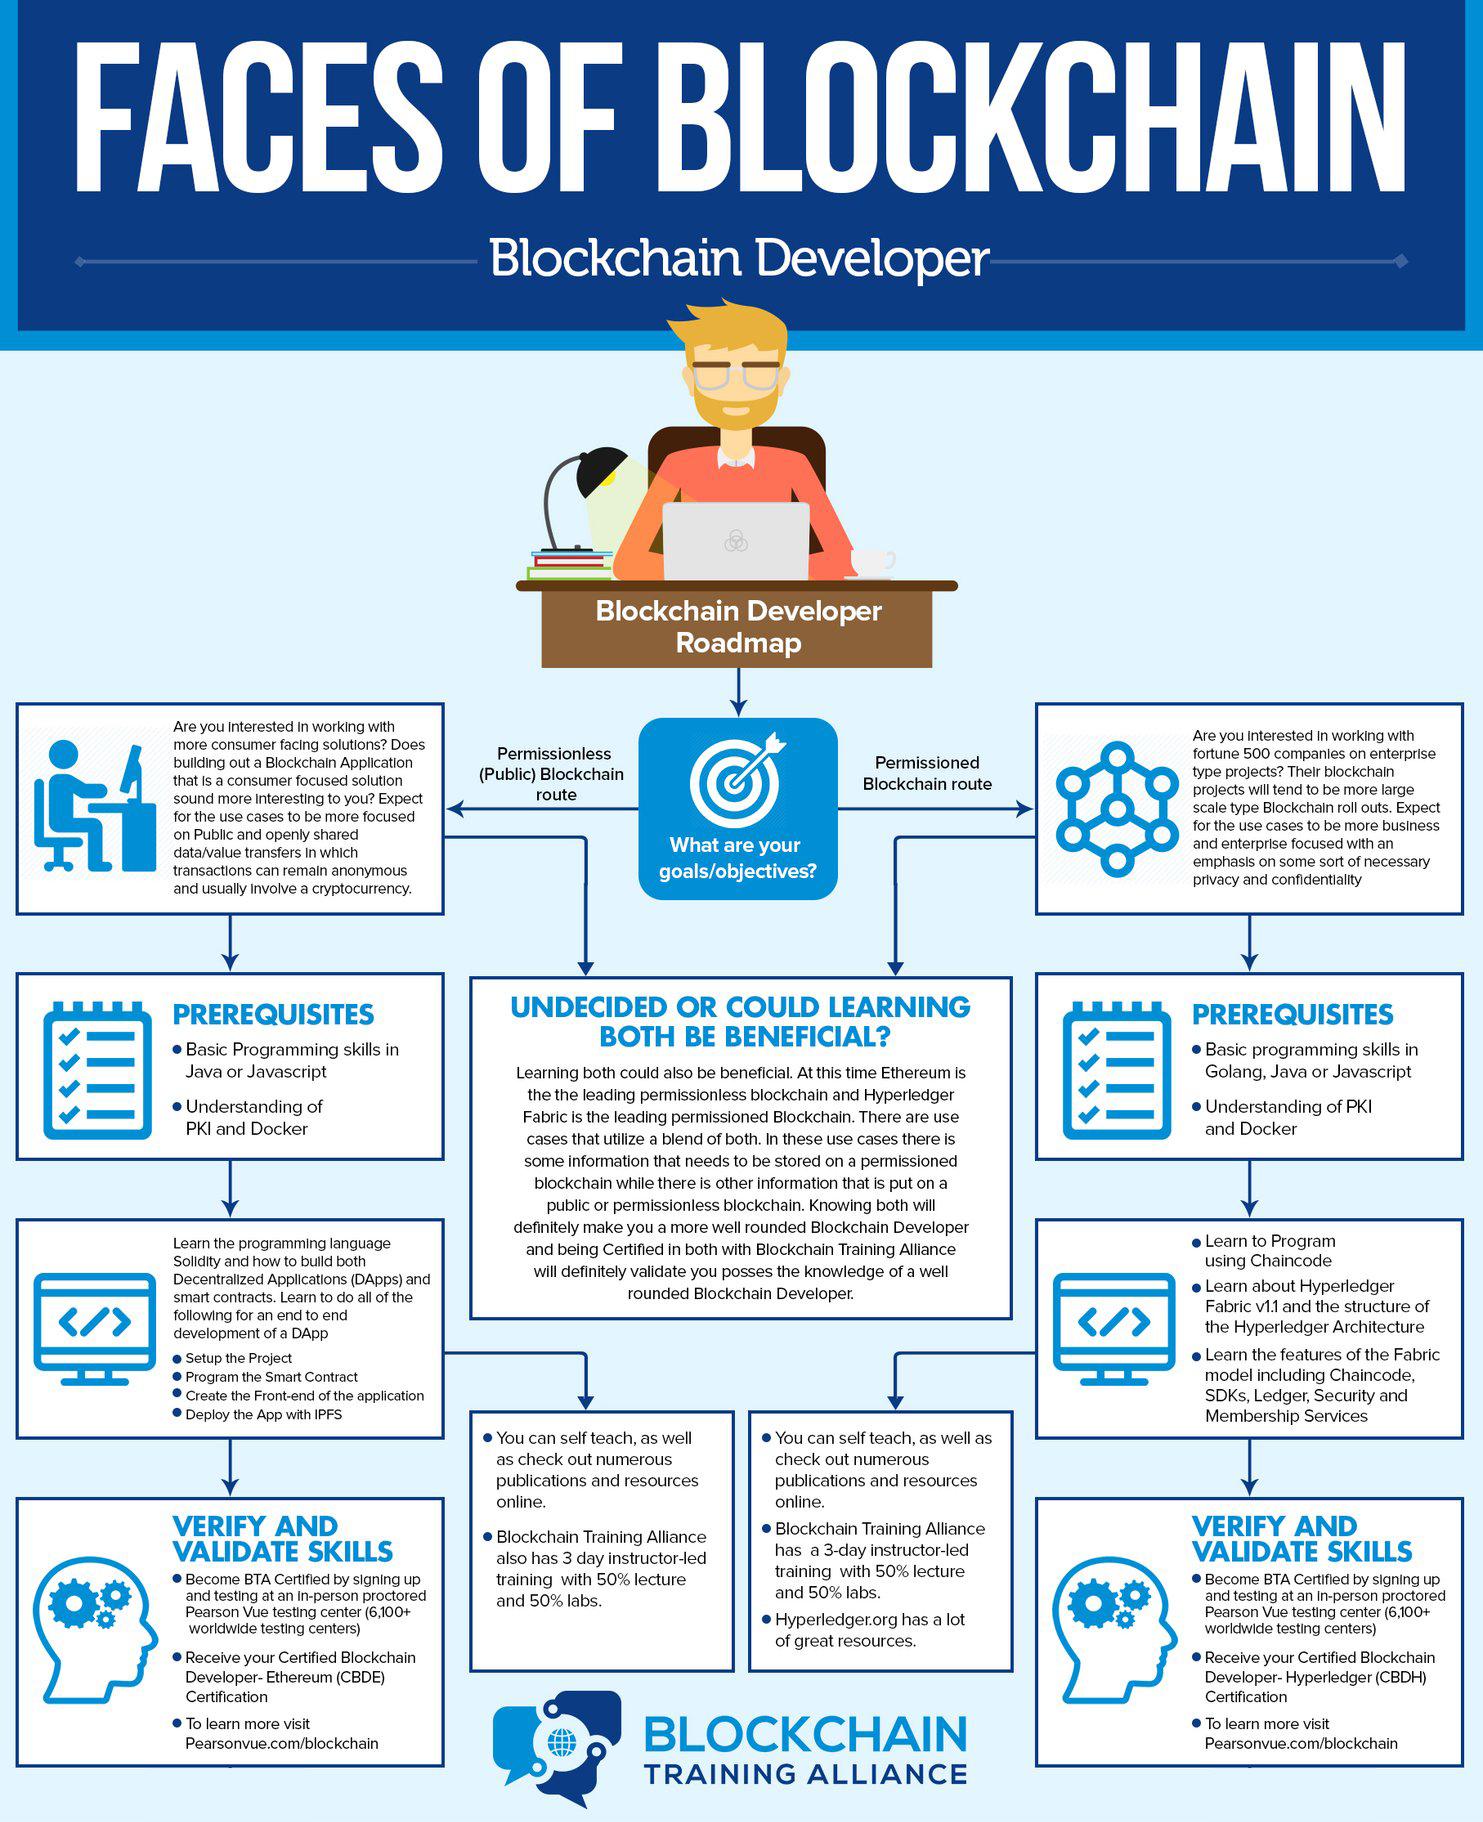 Faces of Blockchain: Developer